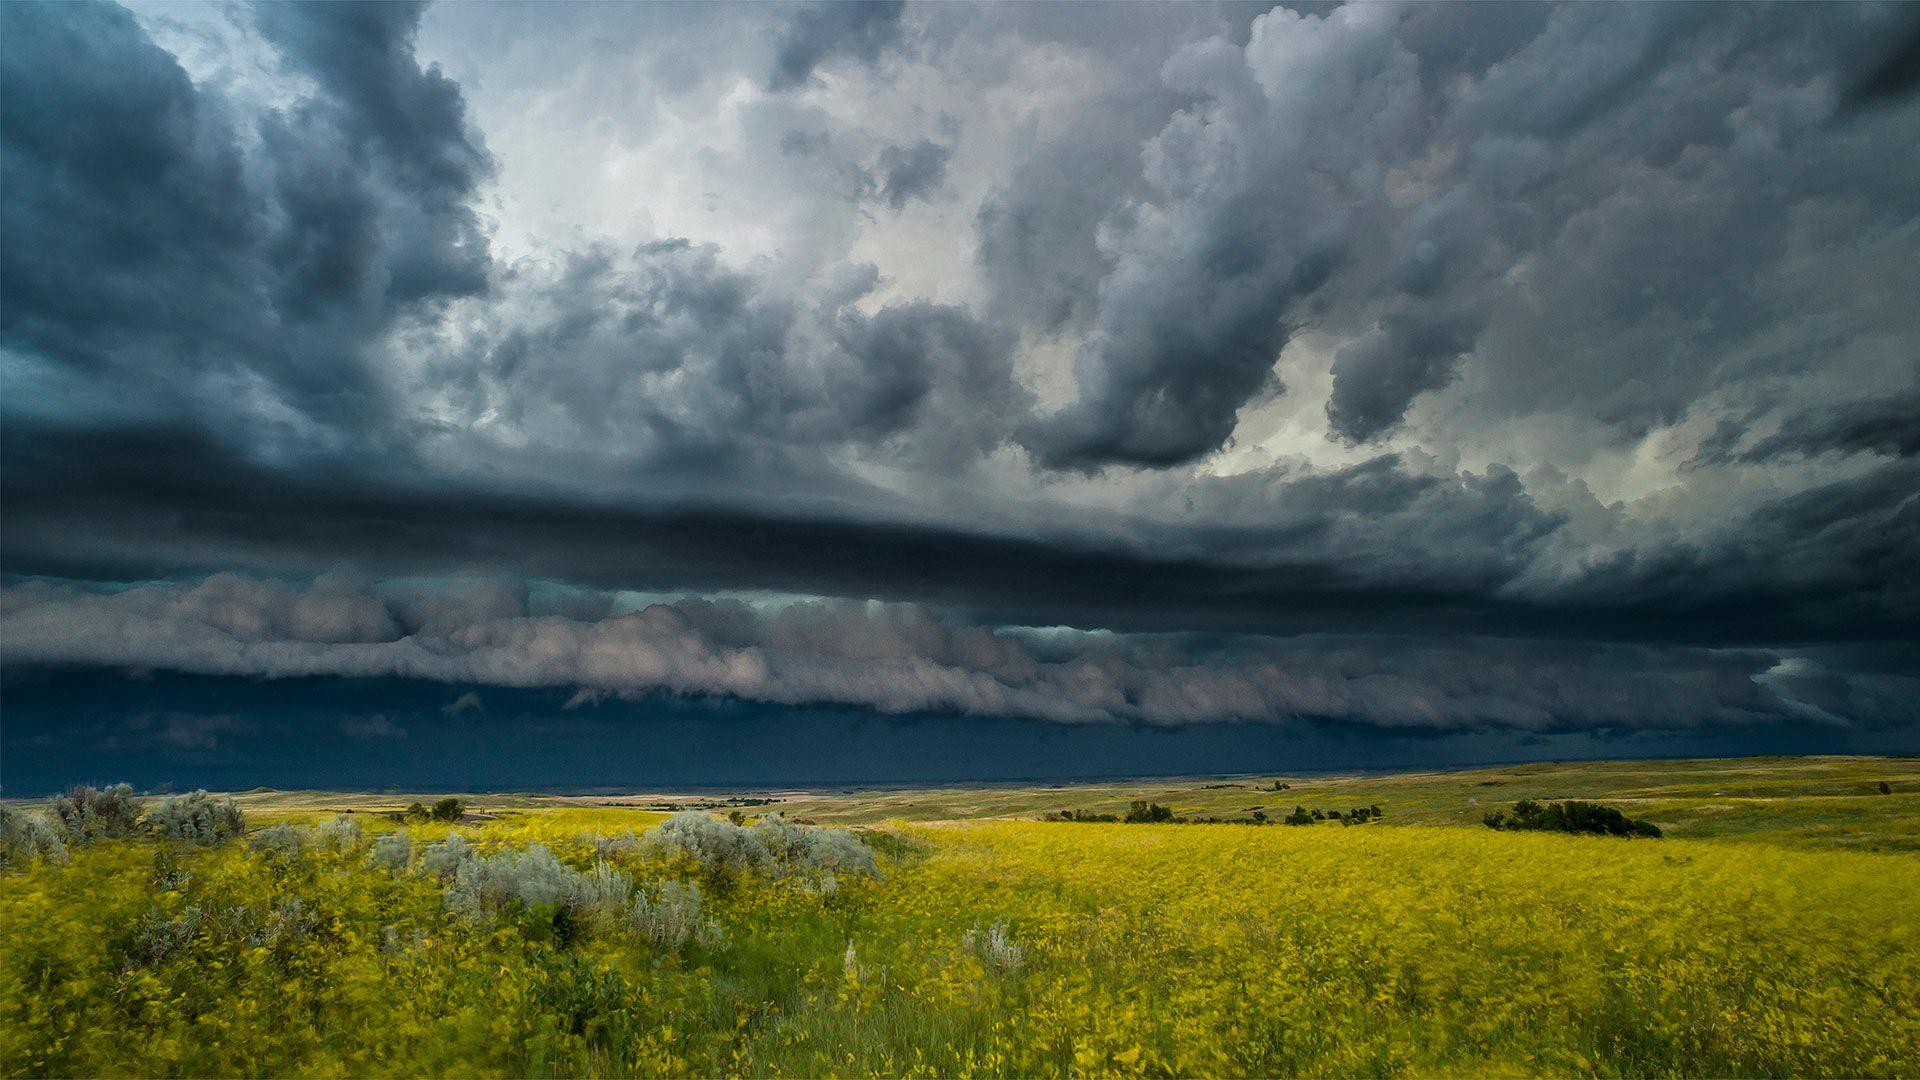 A Thunderstorm Rolls Across Theodore Roosevelt National